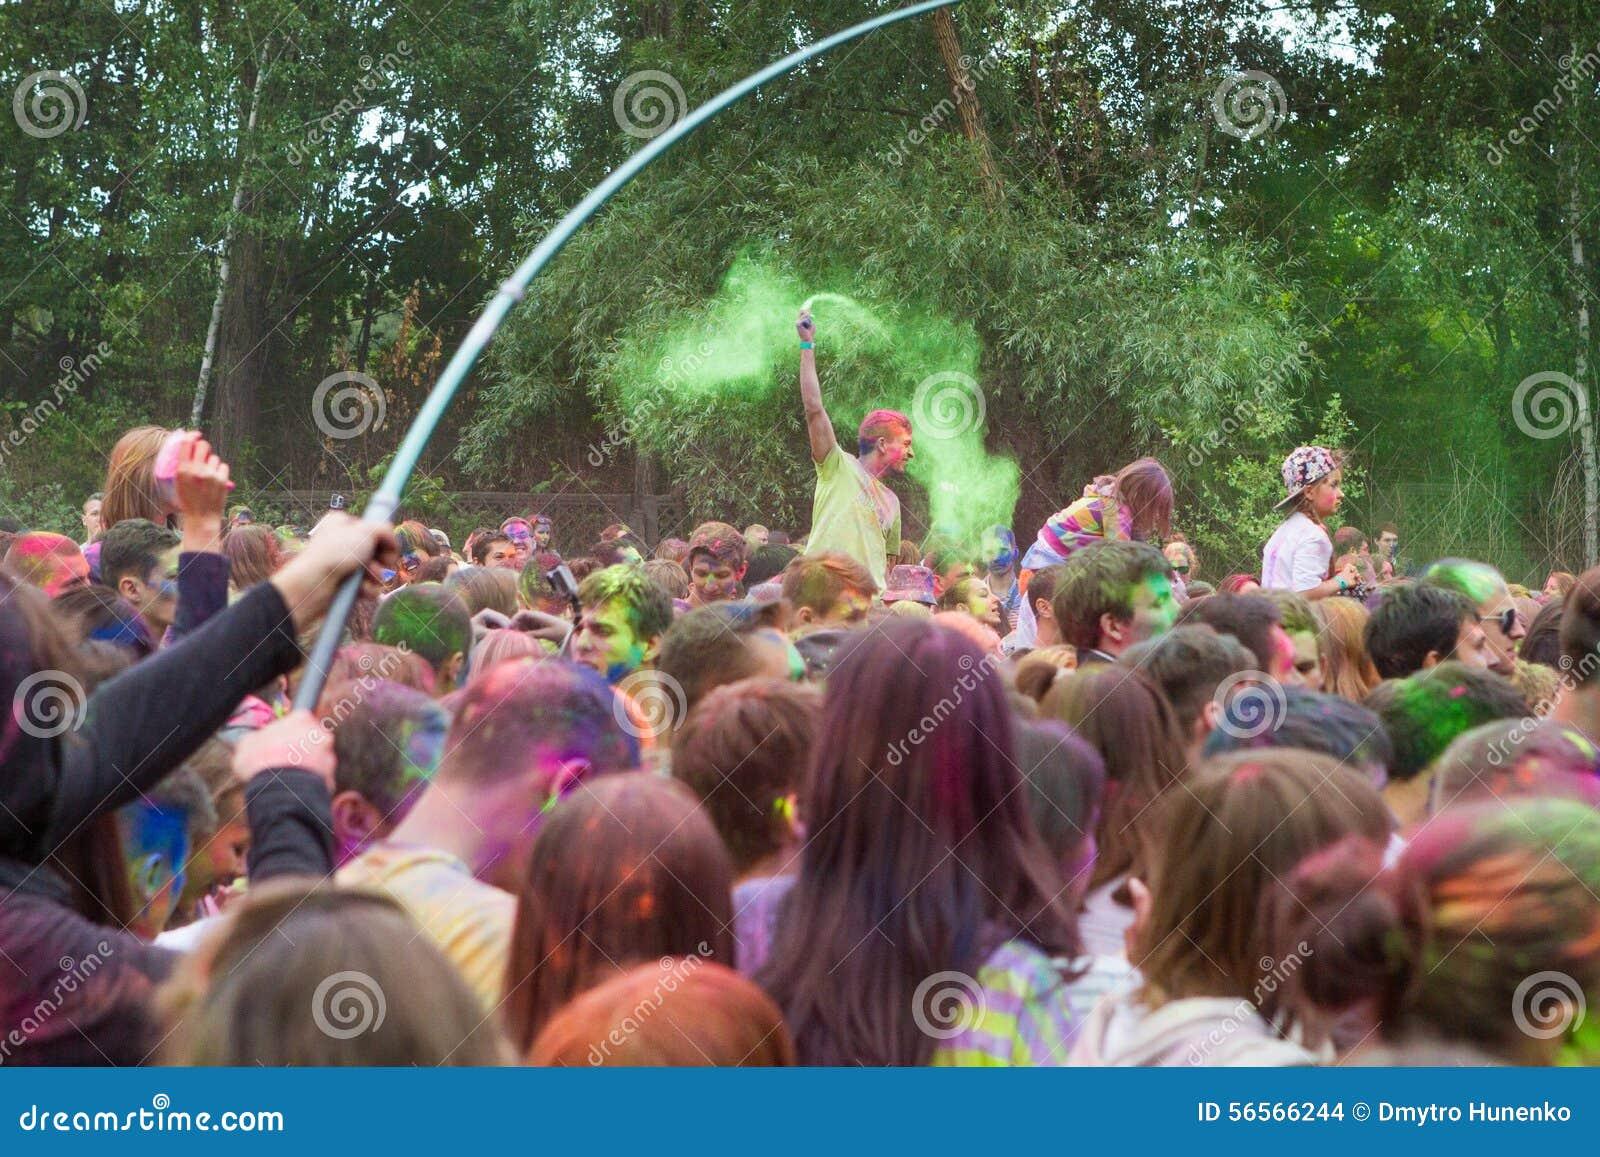 Download Ινδικό φεστιβάλ των χρωμάτων Εκδοτική Στοκ Εικόνα - εικόνα από έχοντας, διασκέδαση: 56566244